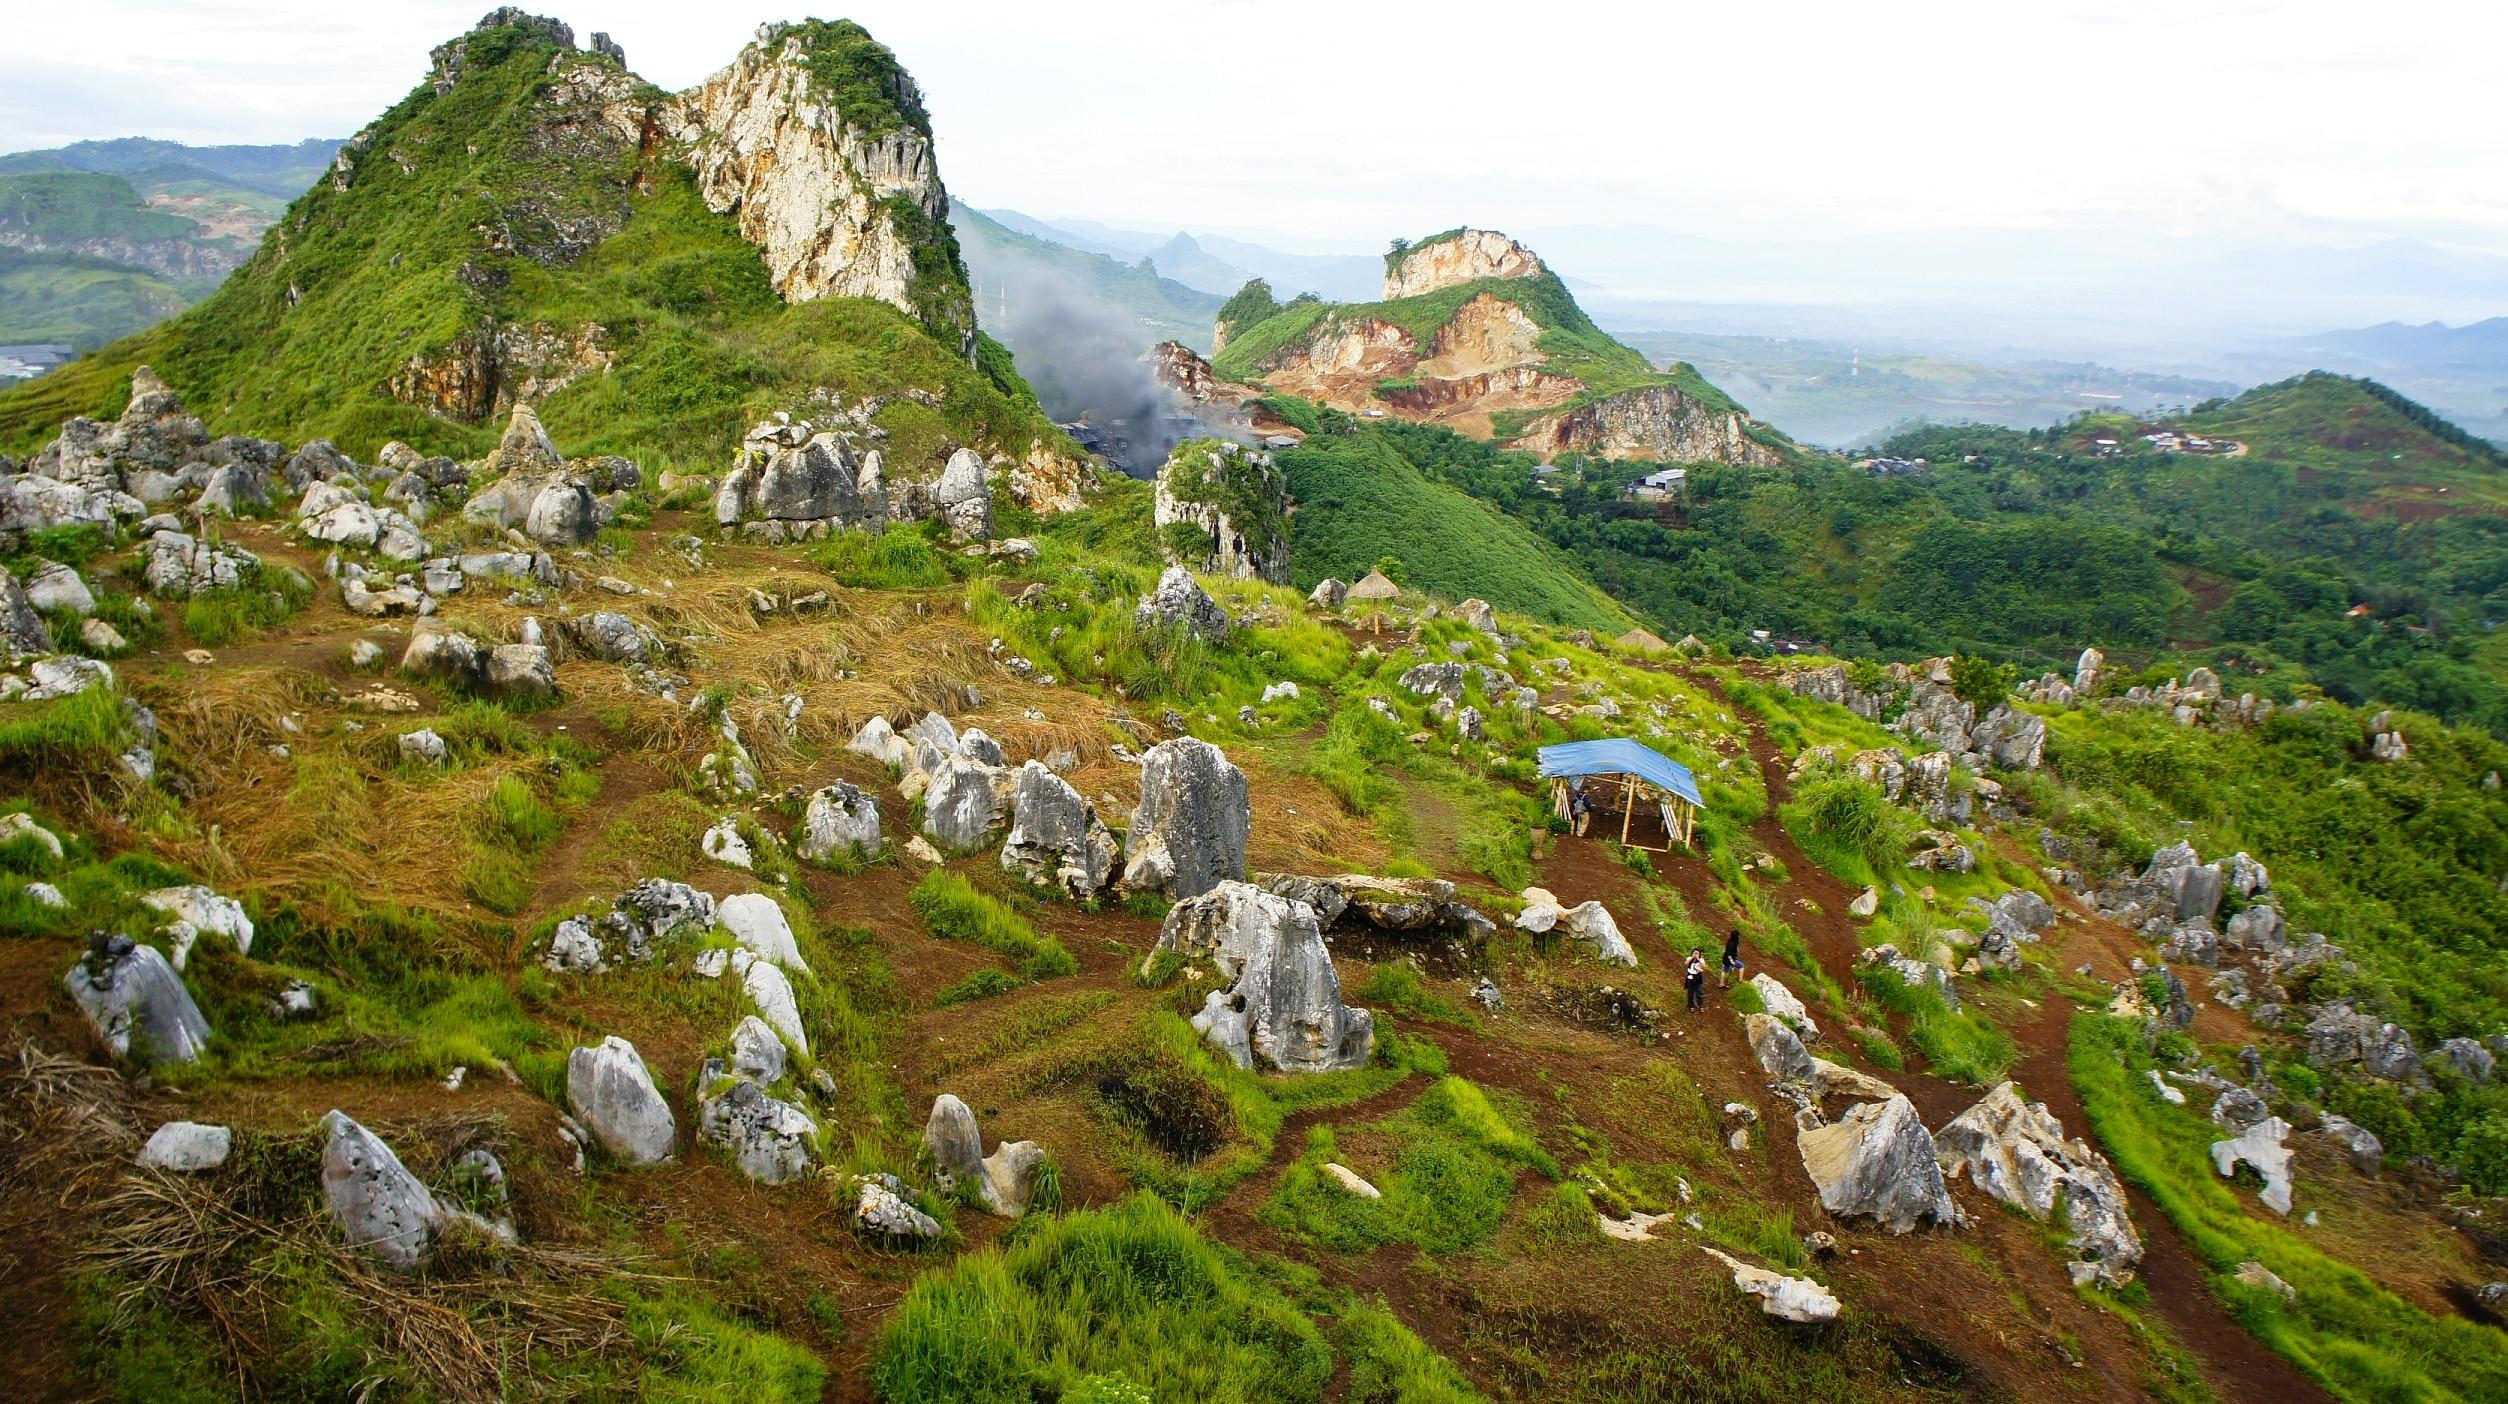 7 Tempat Wisata di Jawa Barat yang Wajib Dikunjungi